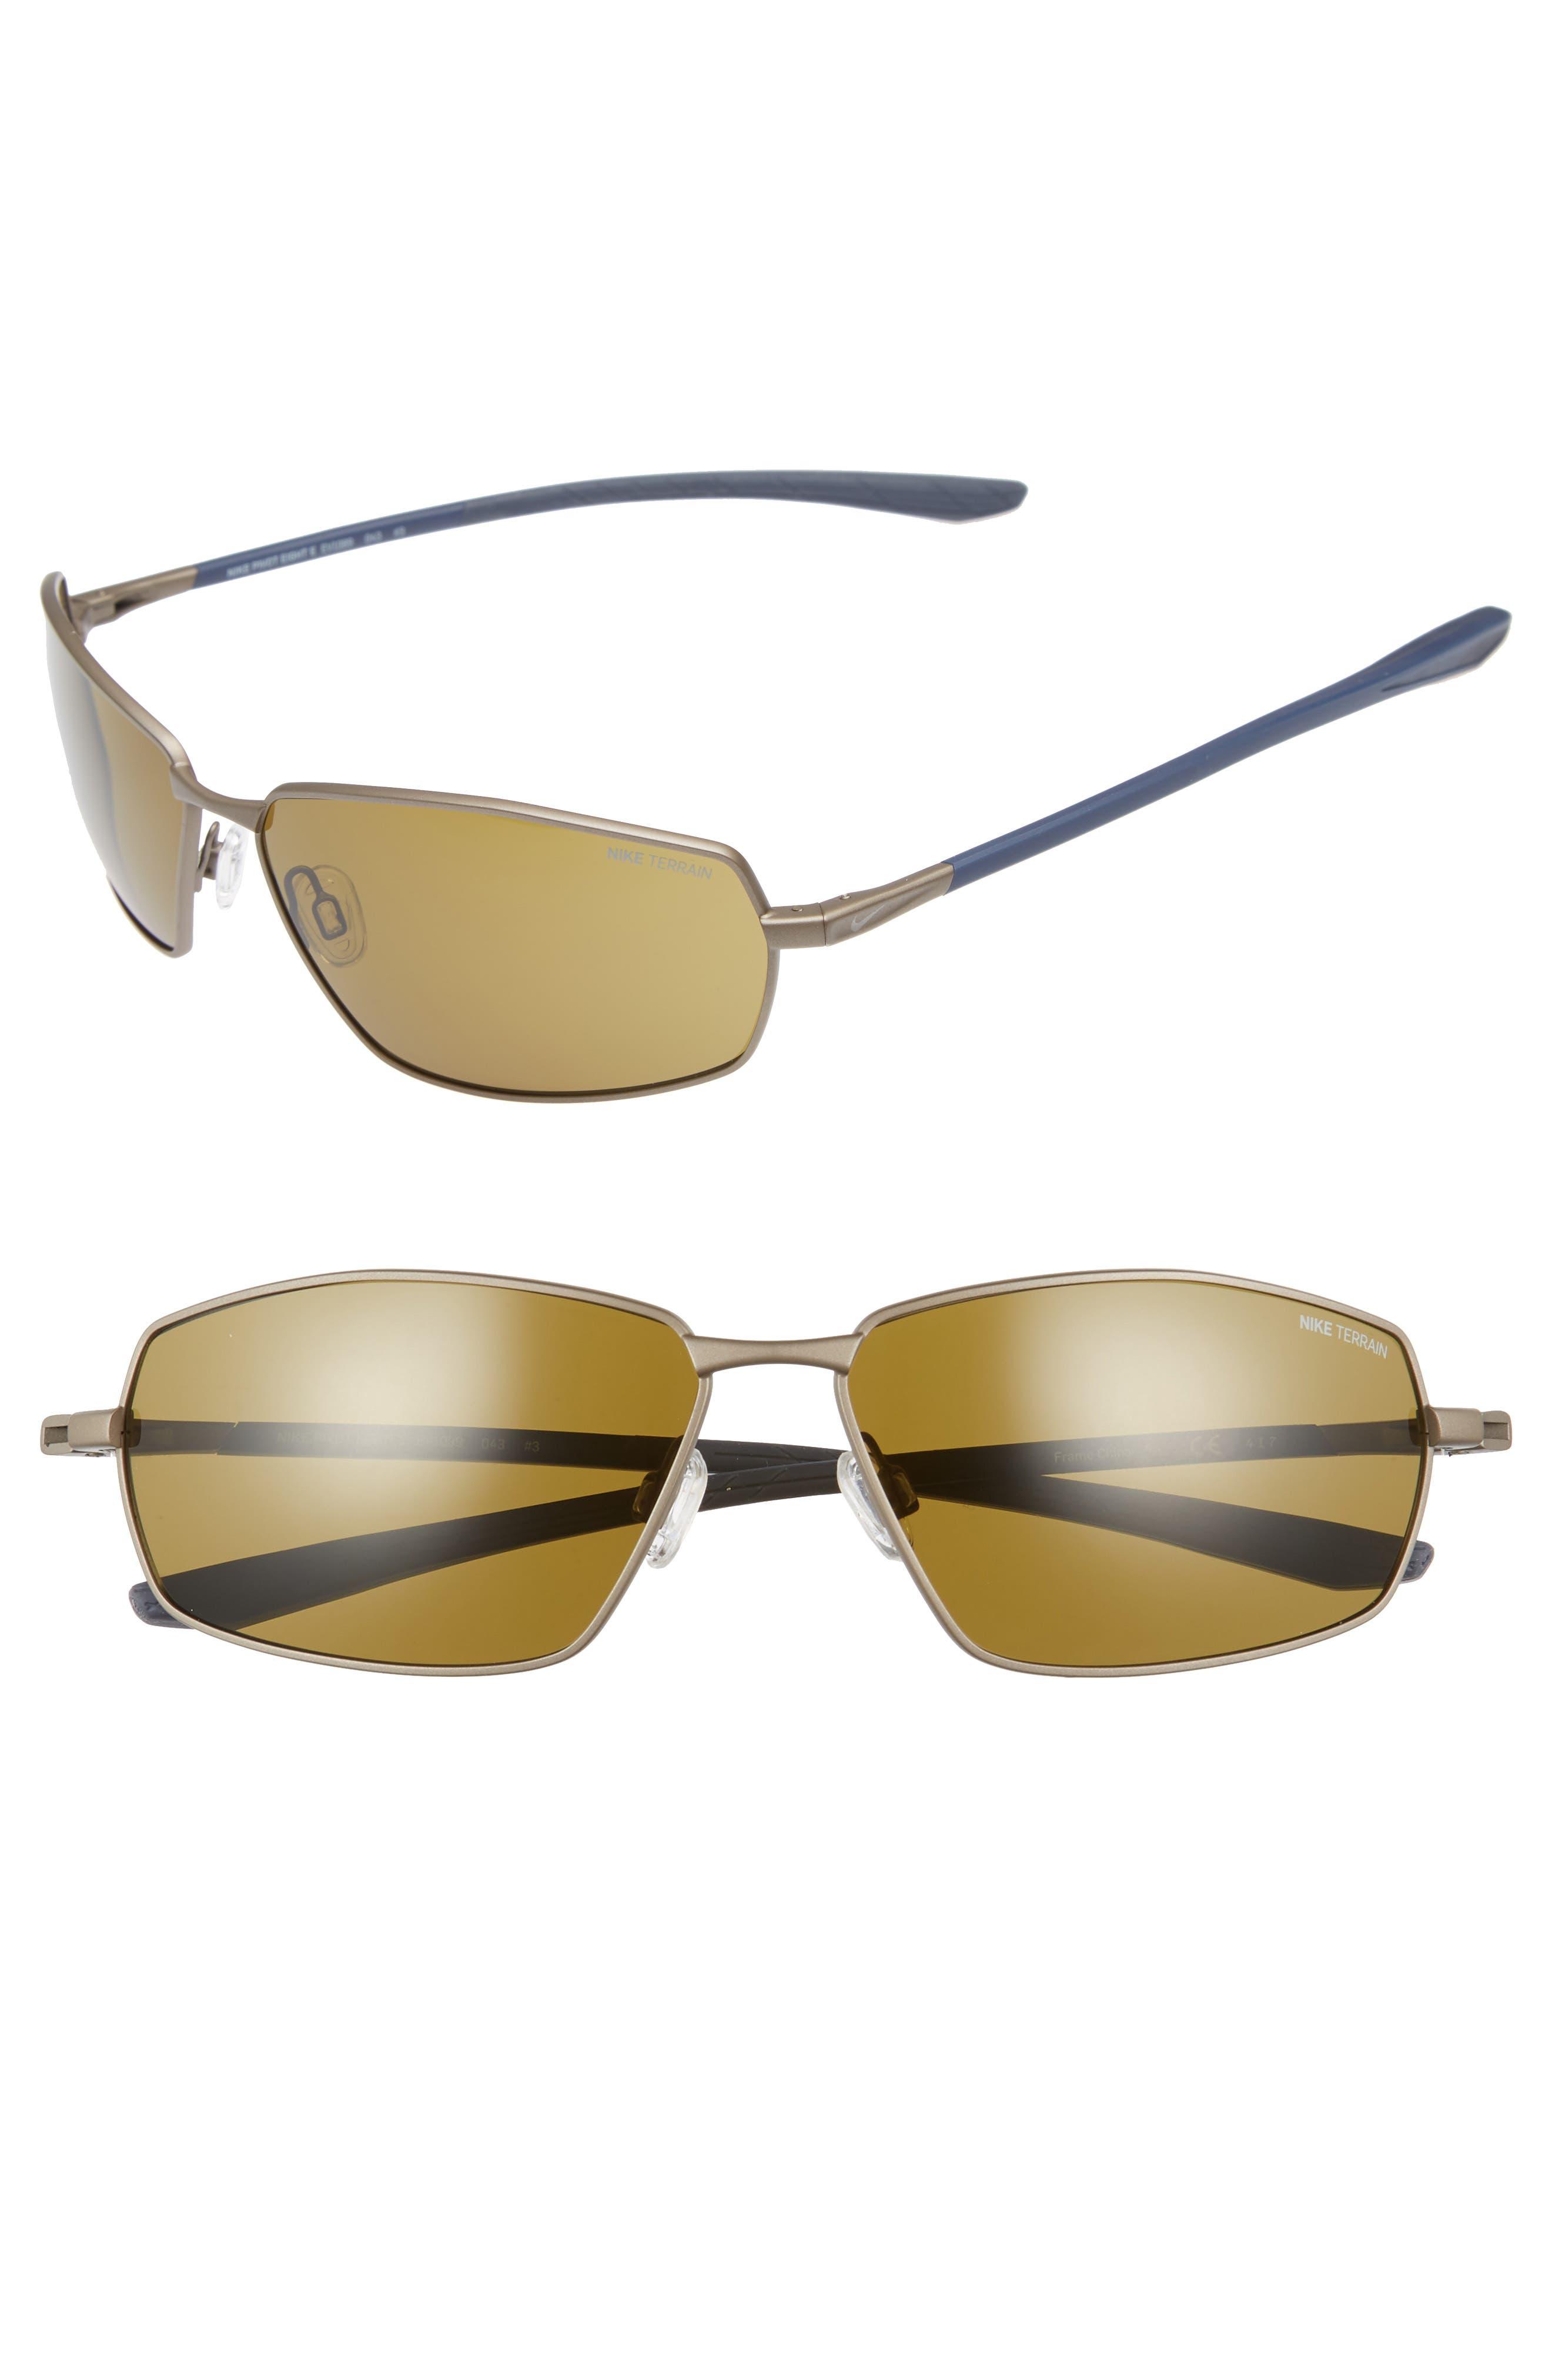 Pivot Eight E 62mm Oversize Sunglasses,                         Main,                         color, Satin Pewter/ Terrain Tint